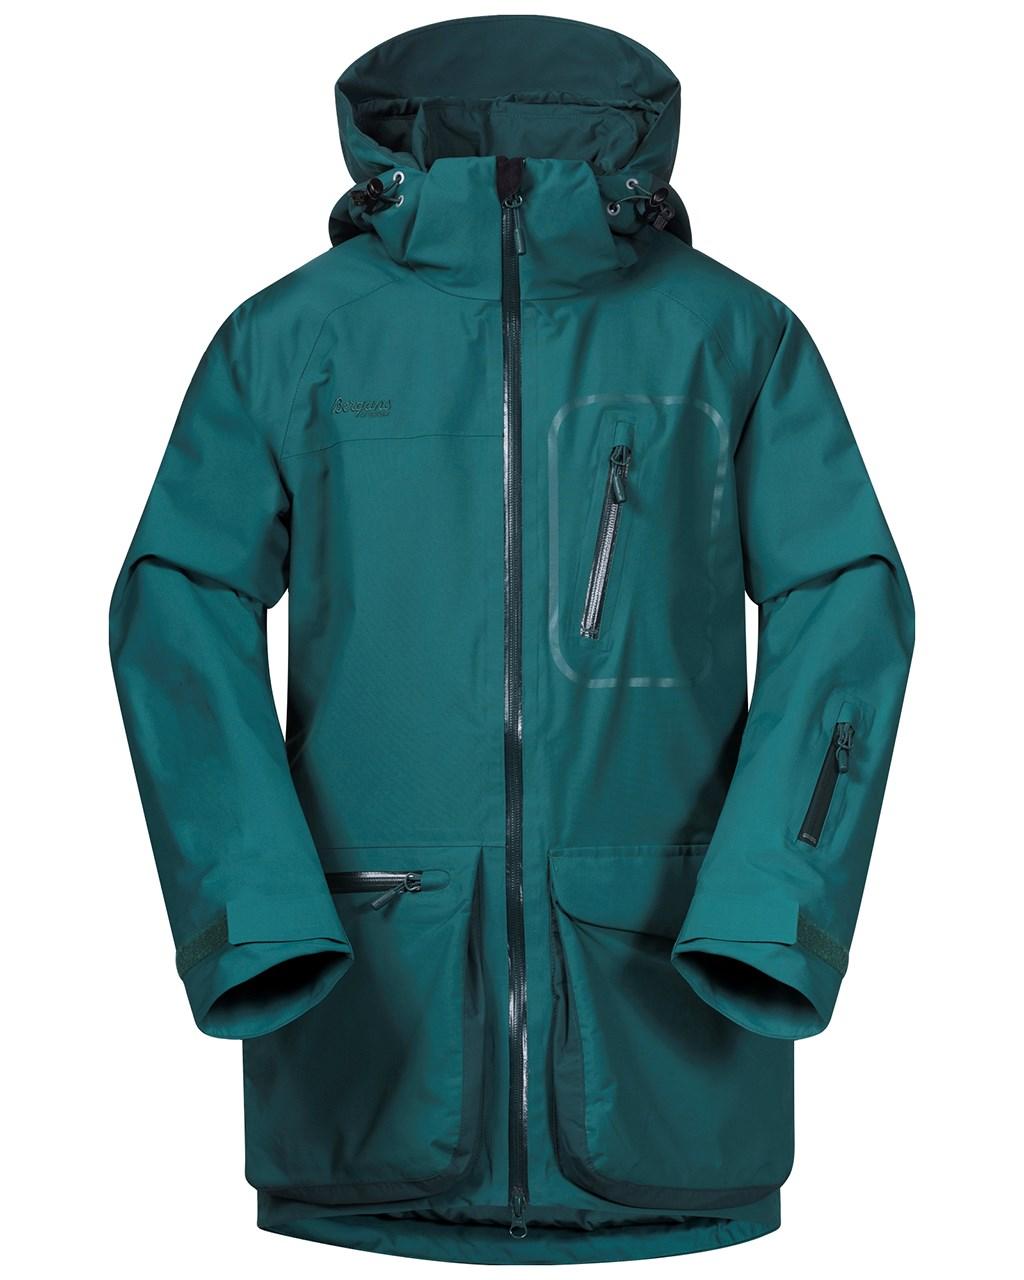 b26390b16bc Knyken Insulated Youth Jacket Alpine/Altitude